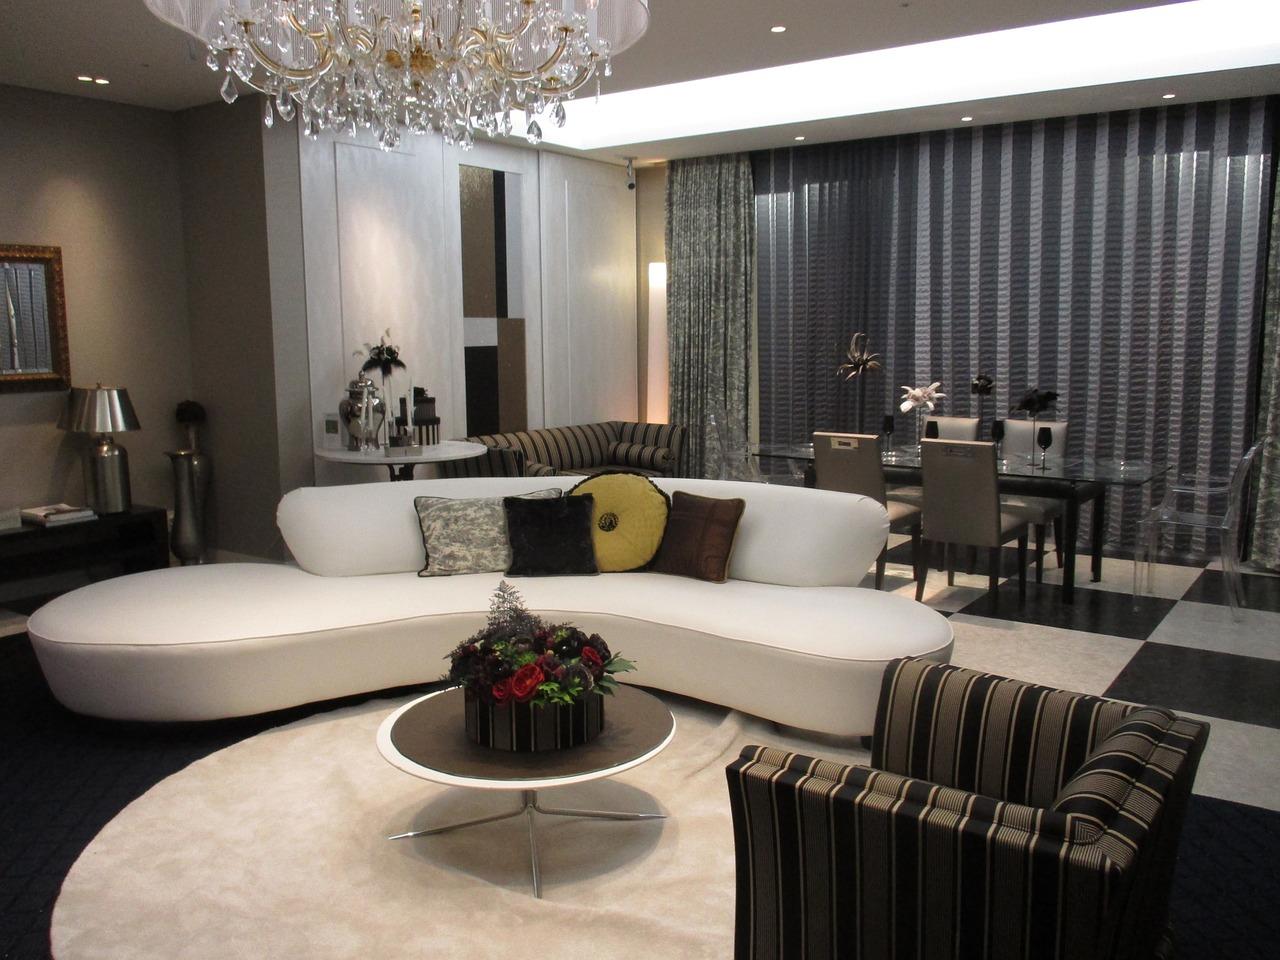 living-room-901080_1280